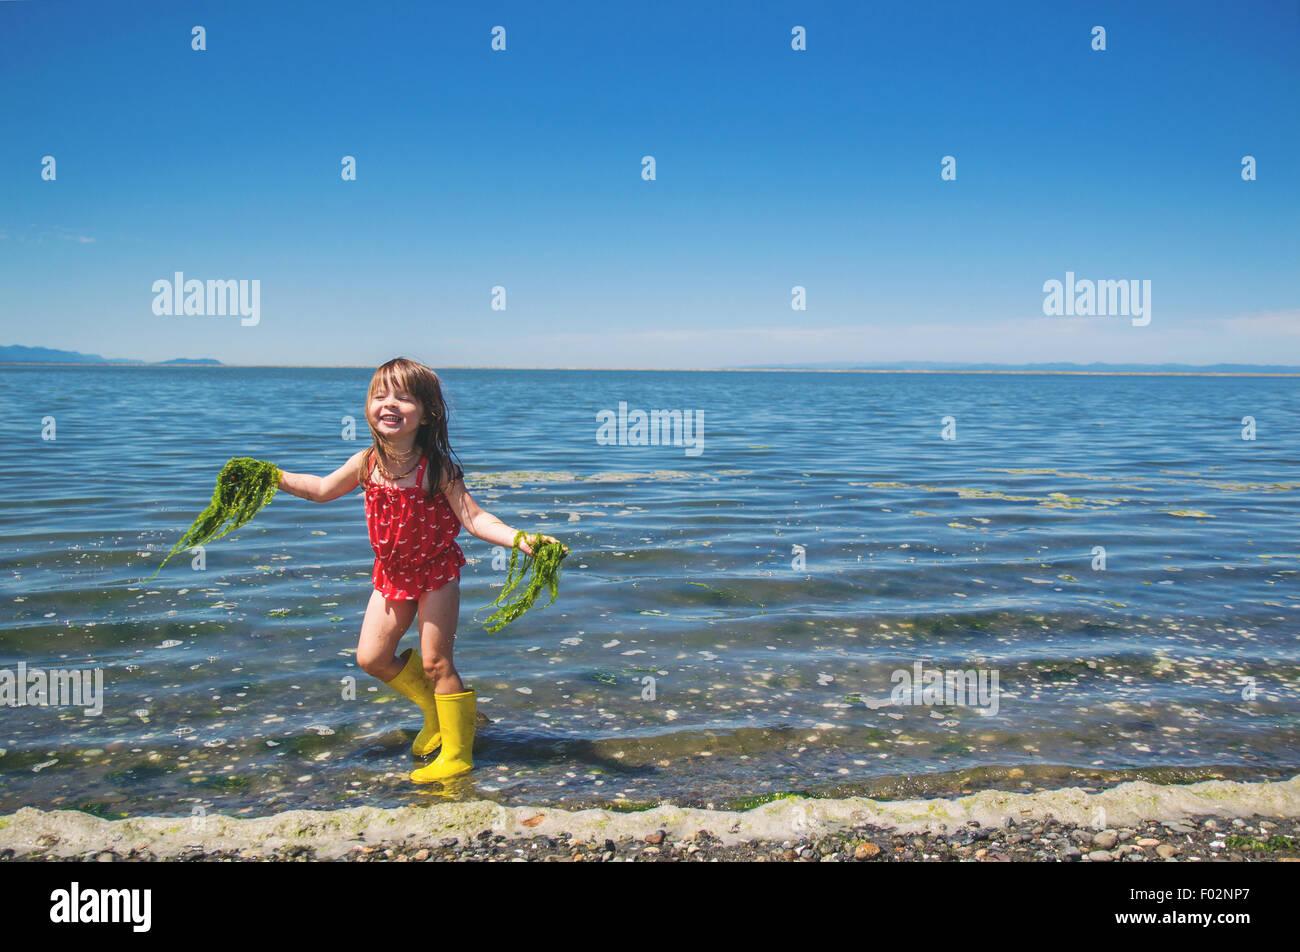 Mädchen sammeln Algen aus dem Meer Stockbild